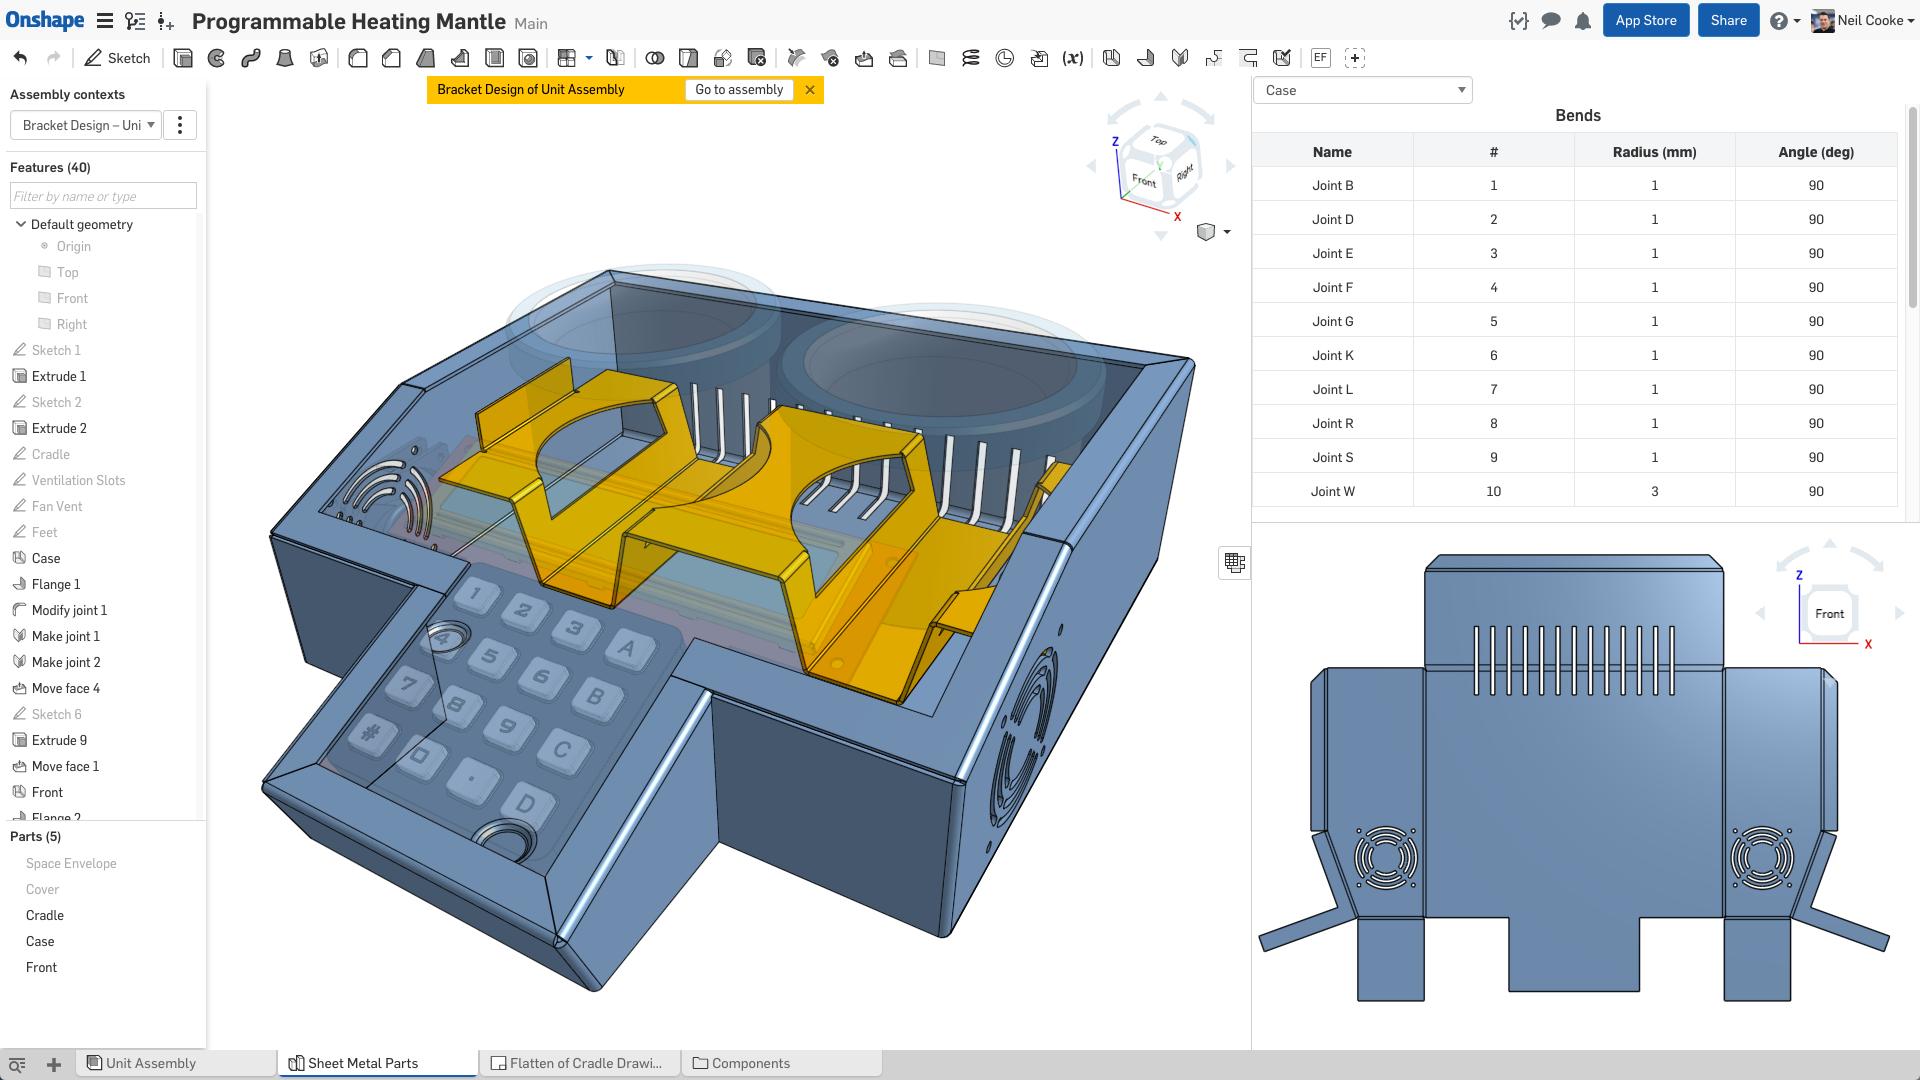 New Onshape Sheet Metal Design Tools Announced Digital